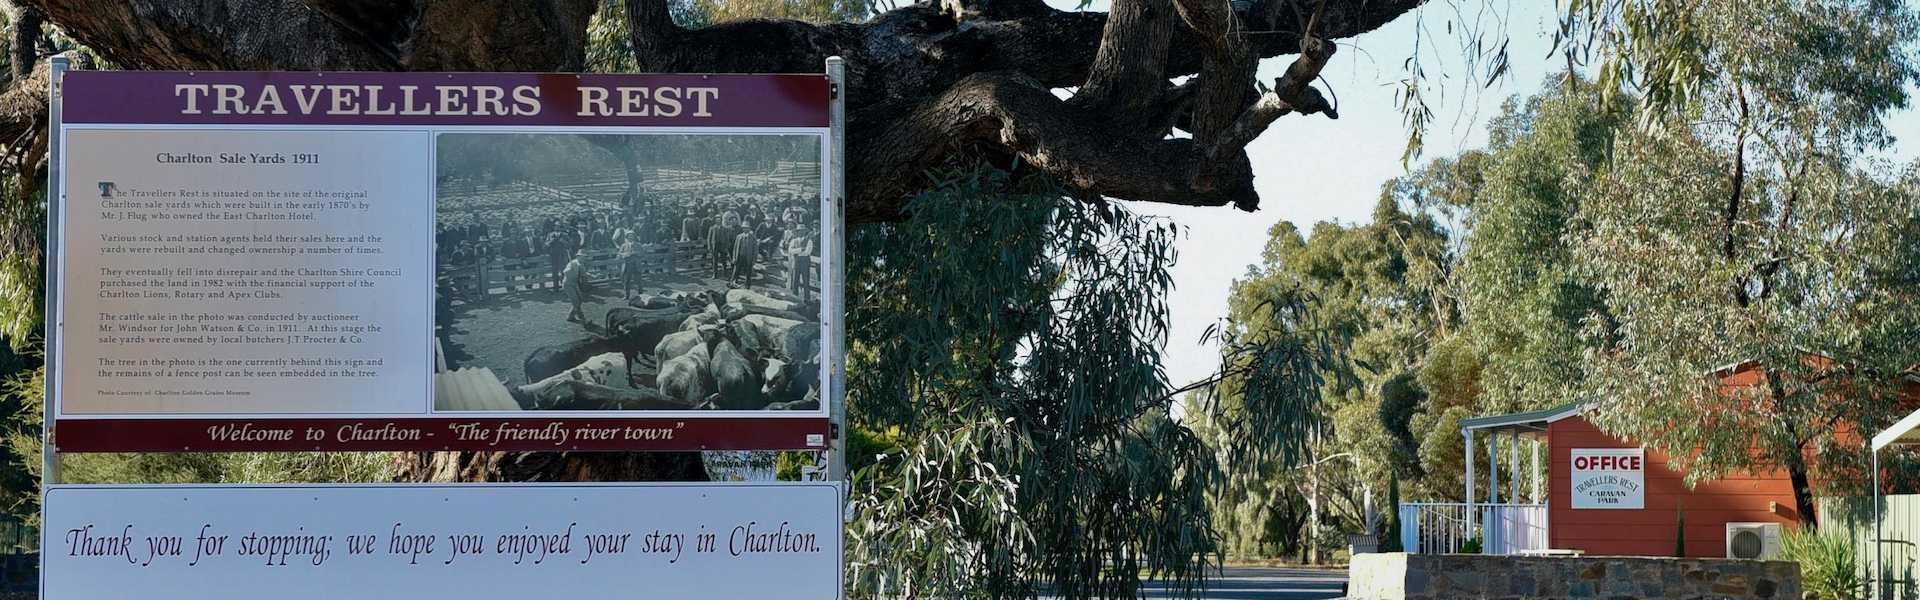 kui parks, charlton, travellers rest, caravan park, entrance